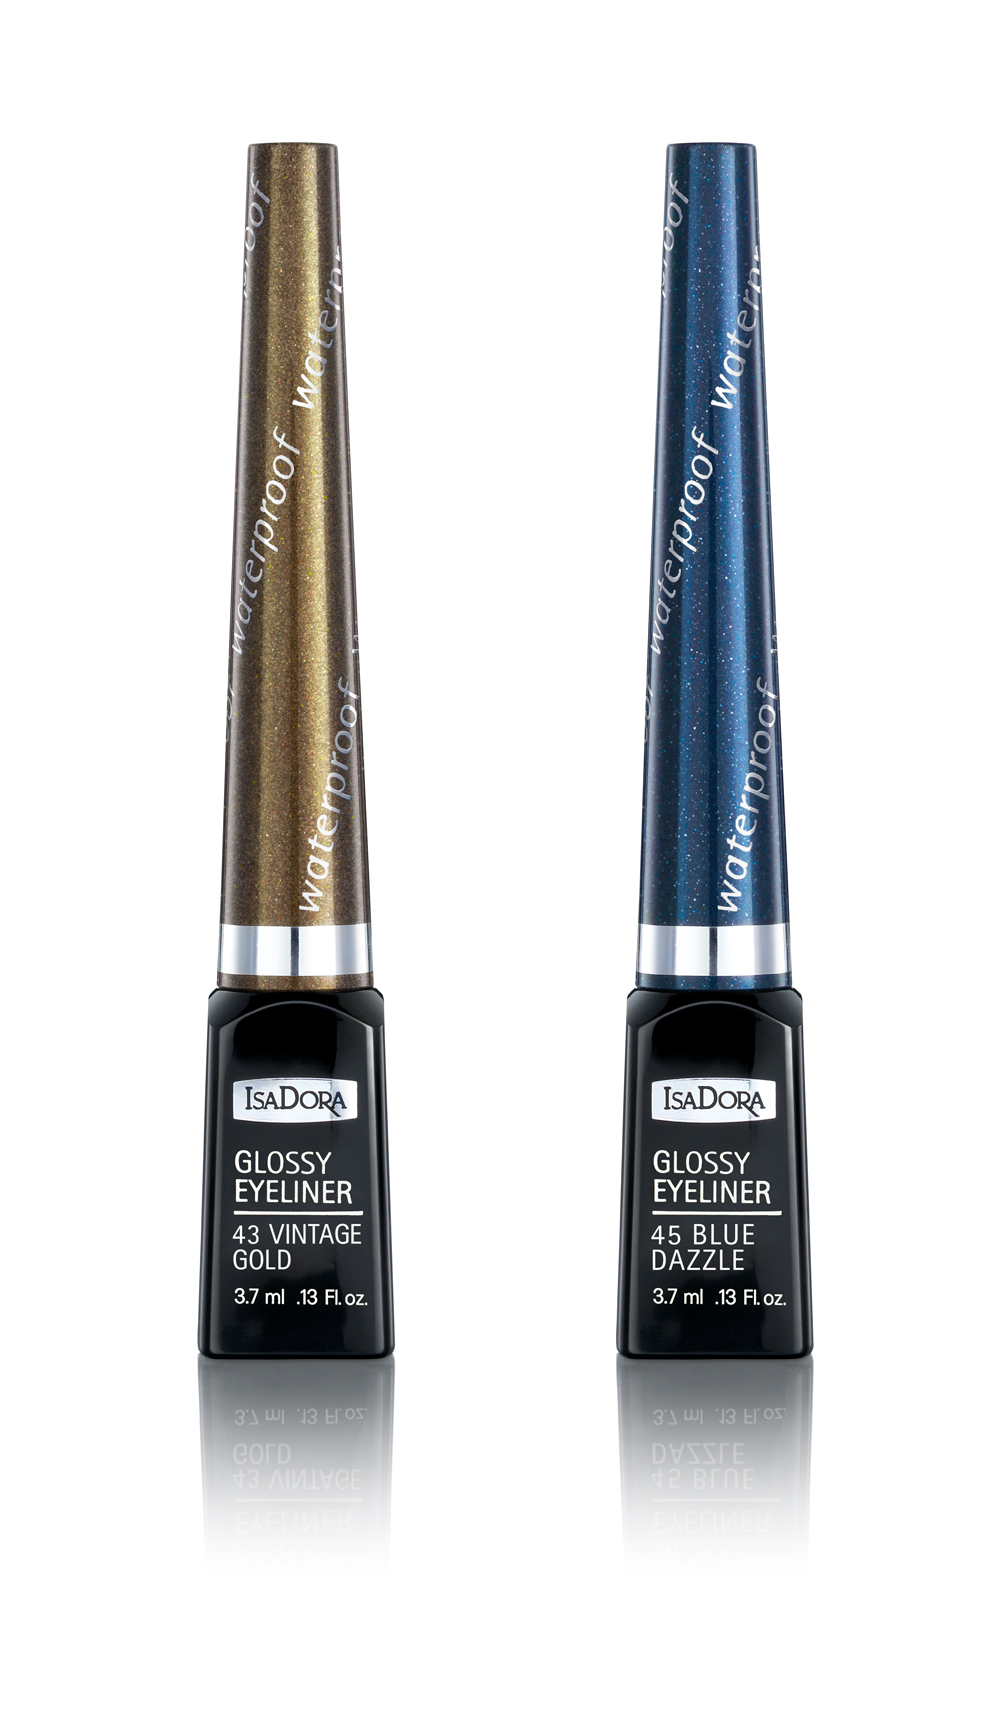 IsaDora Glossy Eyeliner